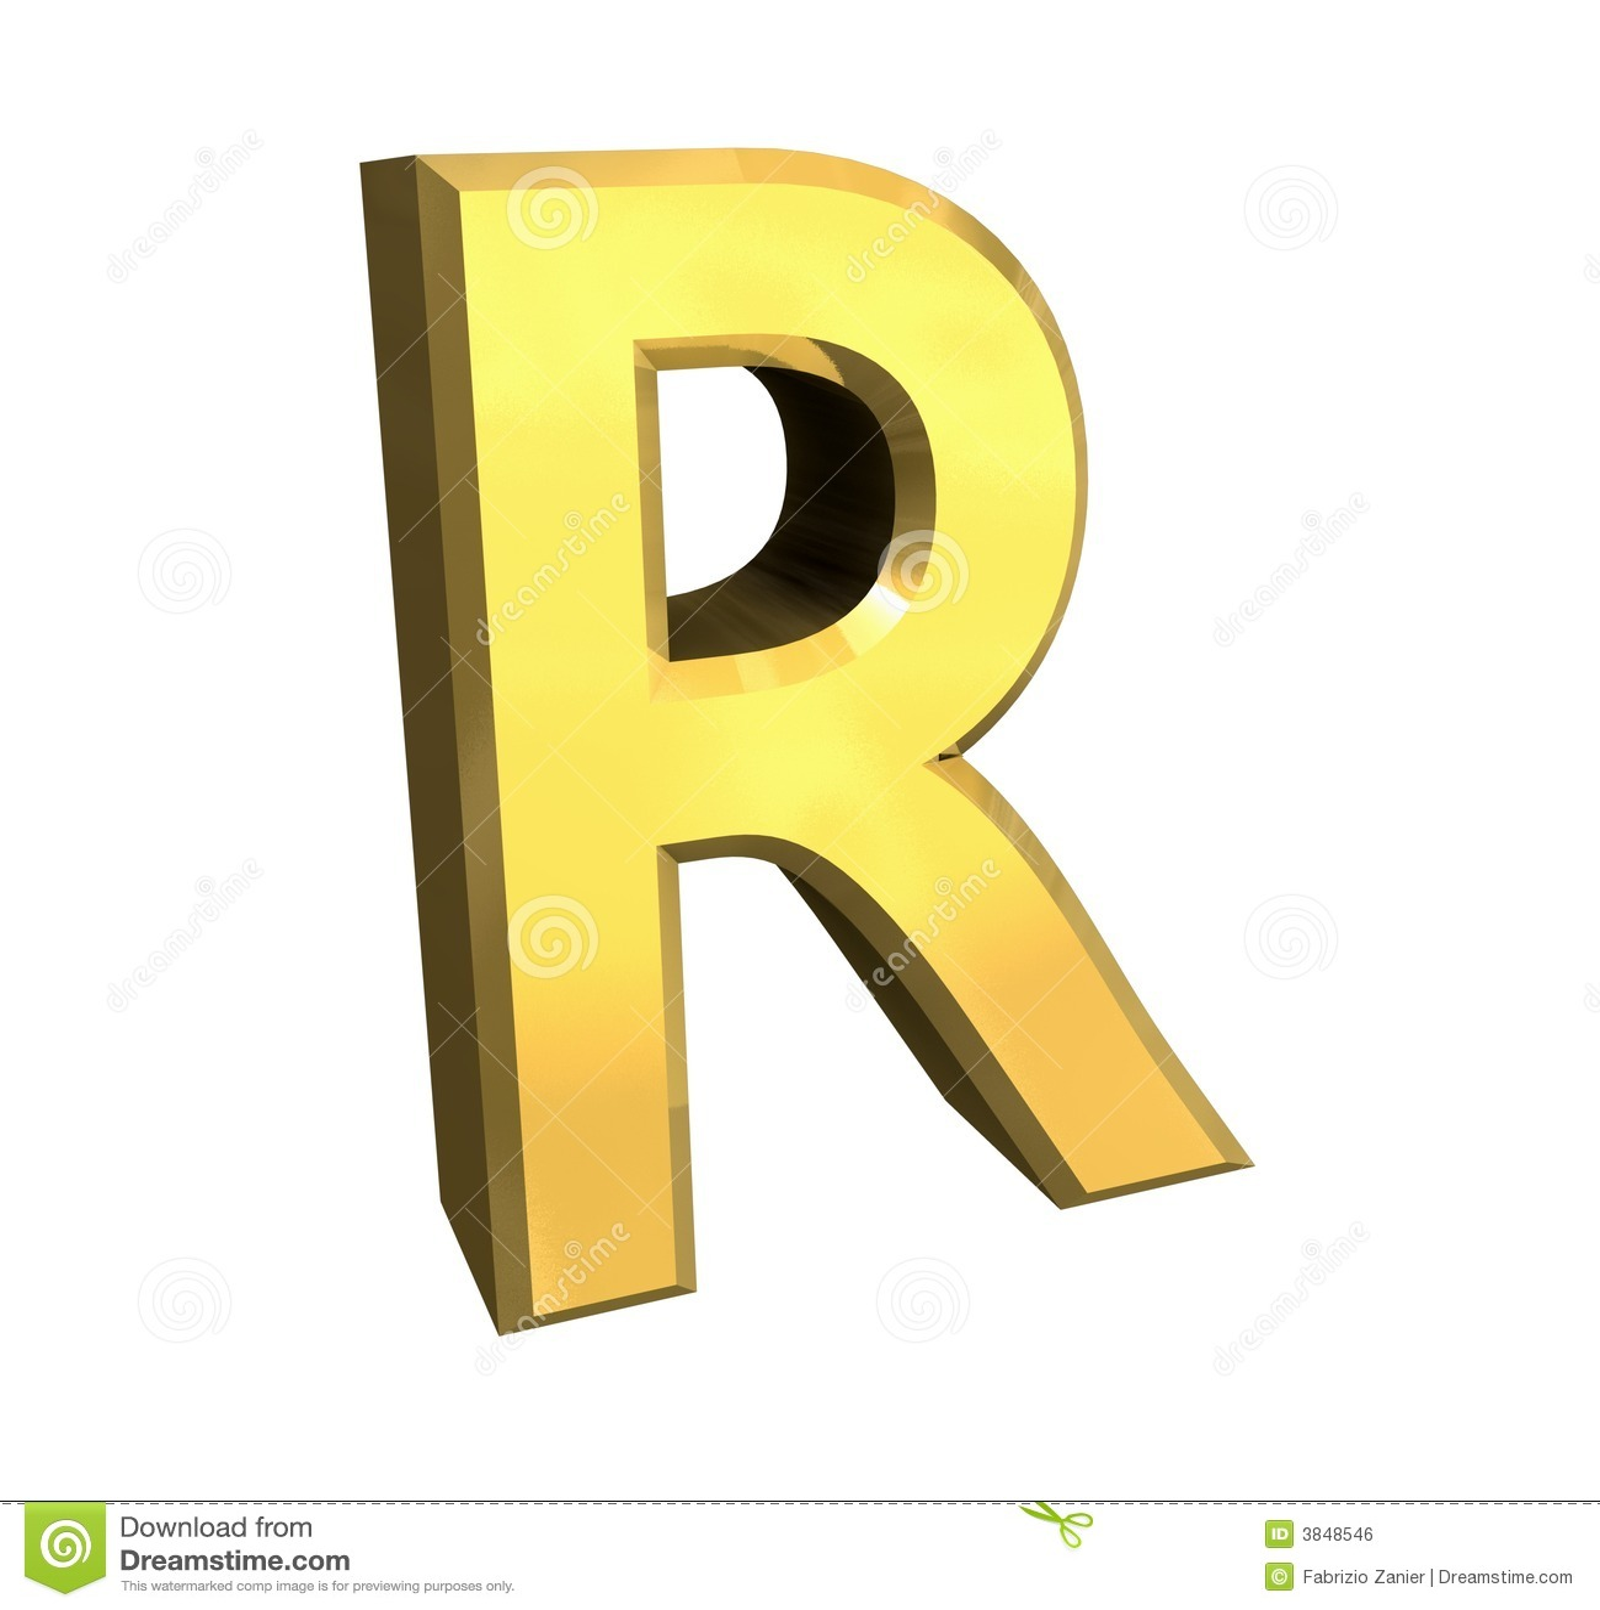 image letter r - photo #43